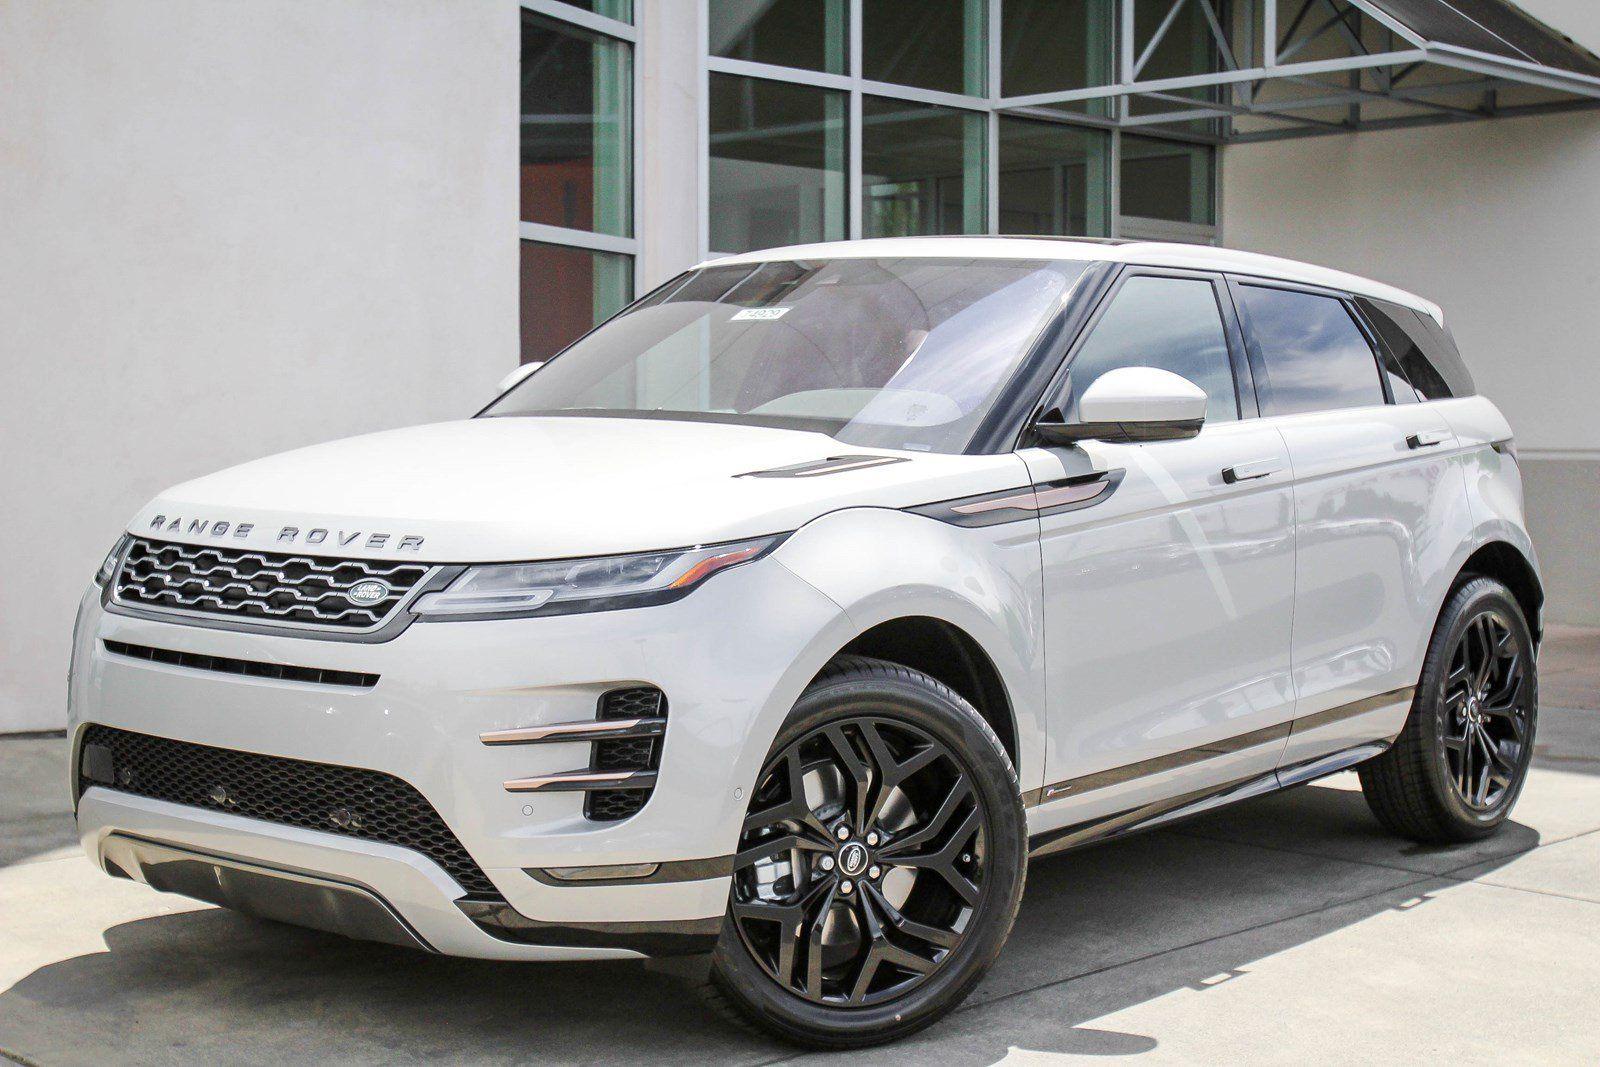 2020 Land Rover Lr2 Model